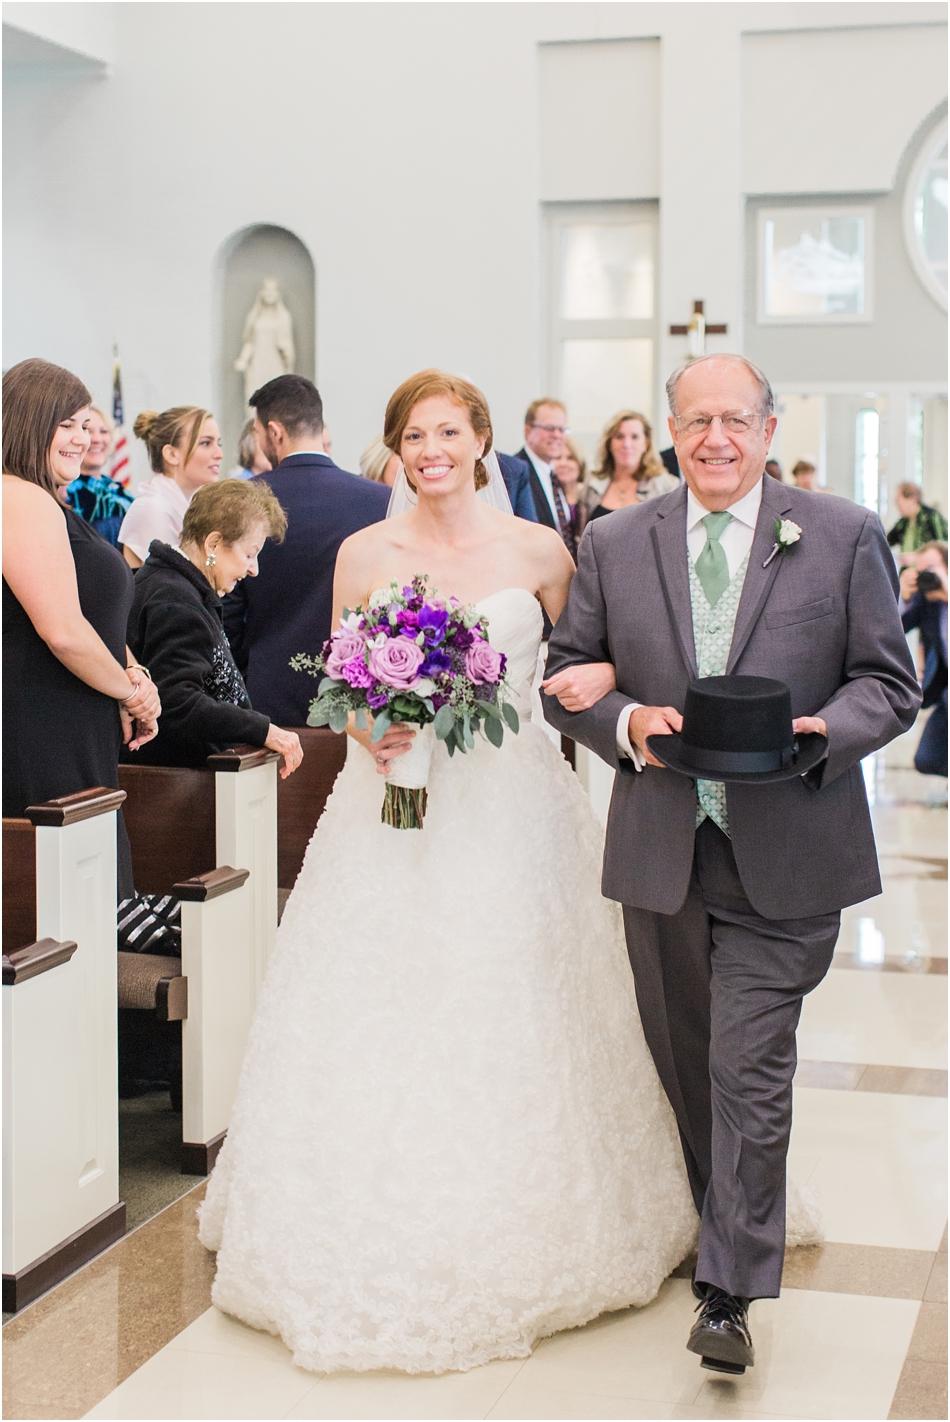 willowbend_megan_david_country_club_cape_cod_boston_new_england_wedding_photographer_Meredith_Jane_Photography_photo_0187.jpg